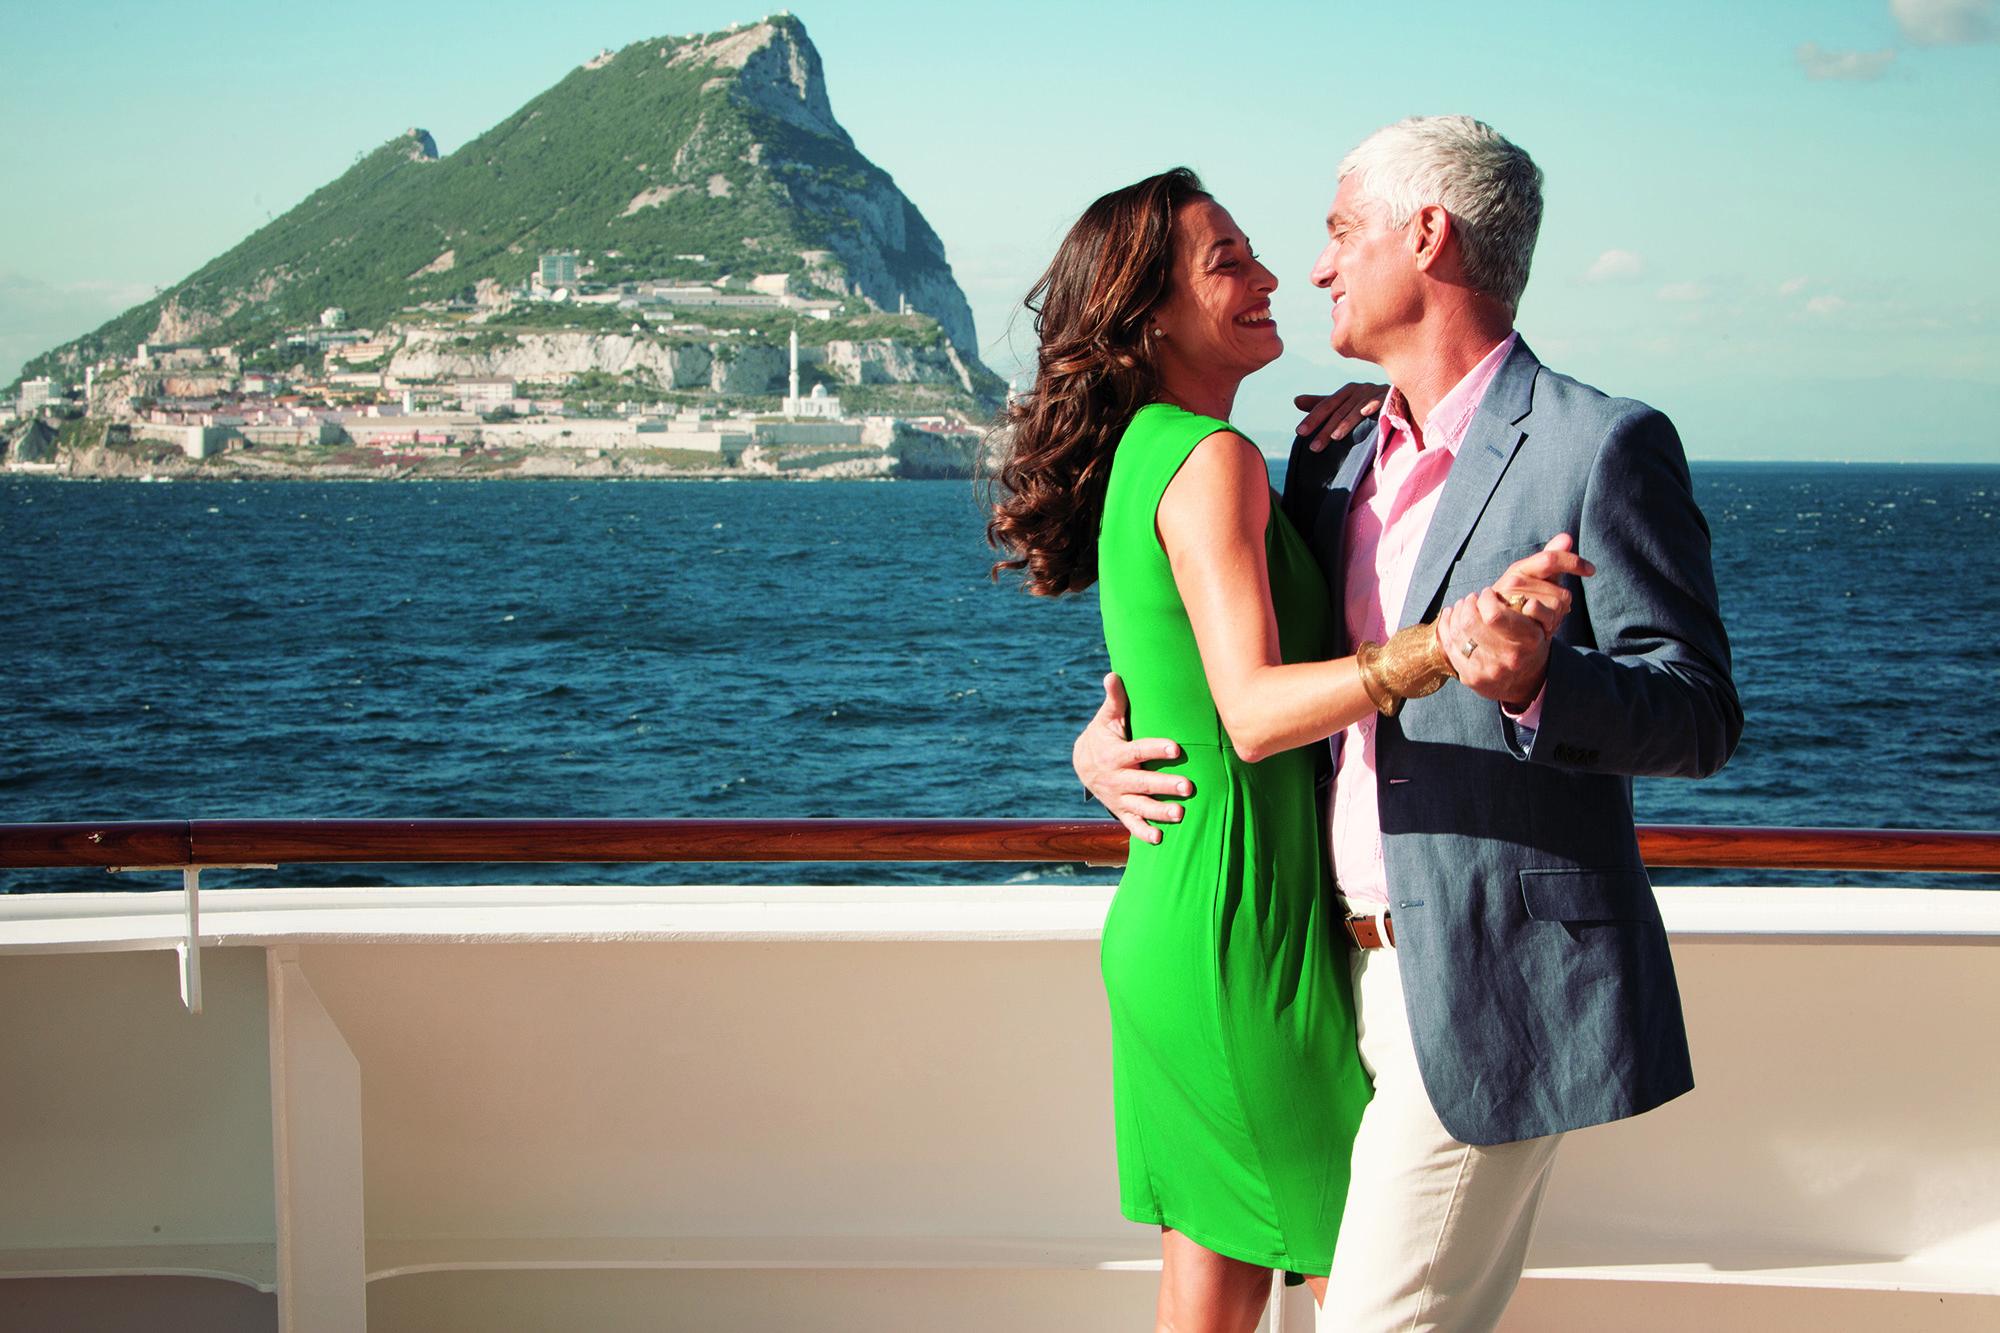 cc_lifestyle_deck-couplesmiling4 (1).jpg